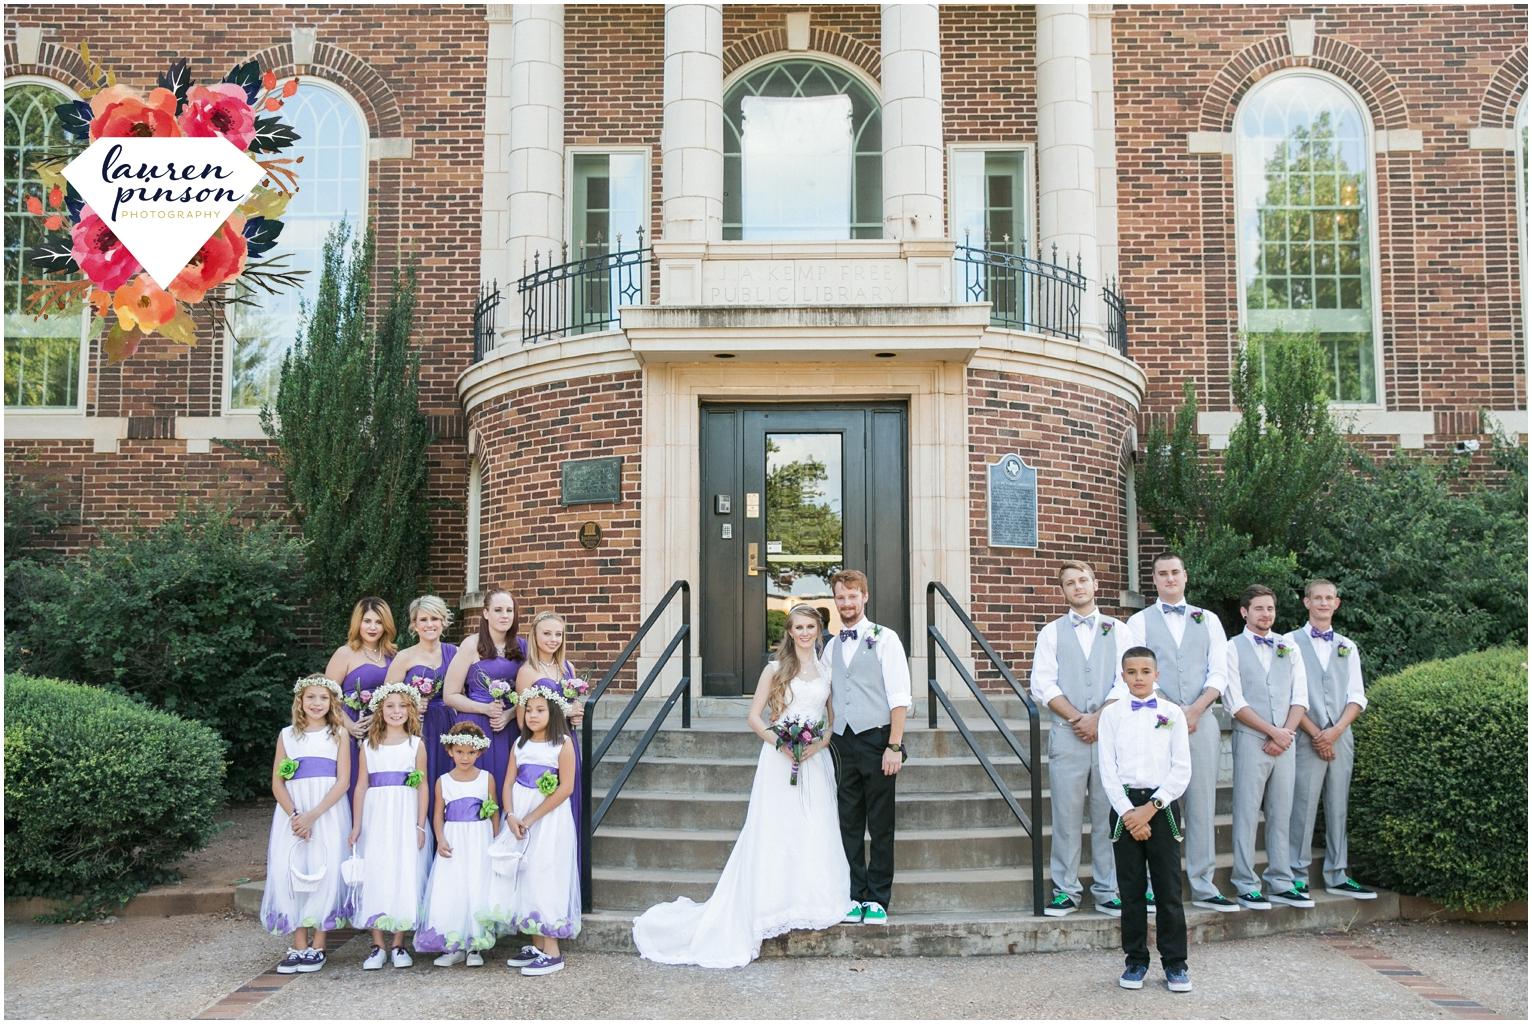 wichita-falls-wedding-photography-at-fain-presbyterian-church-and-the-wellington-timeless-classic-modern-photographer_1237.jpg